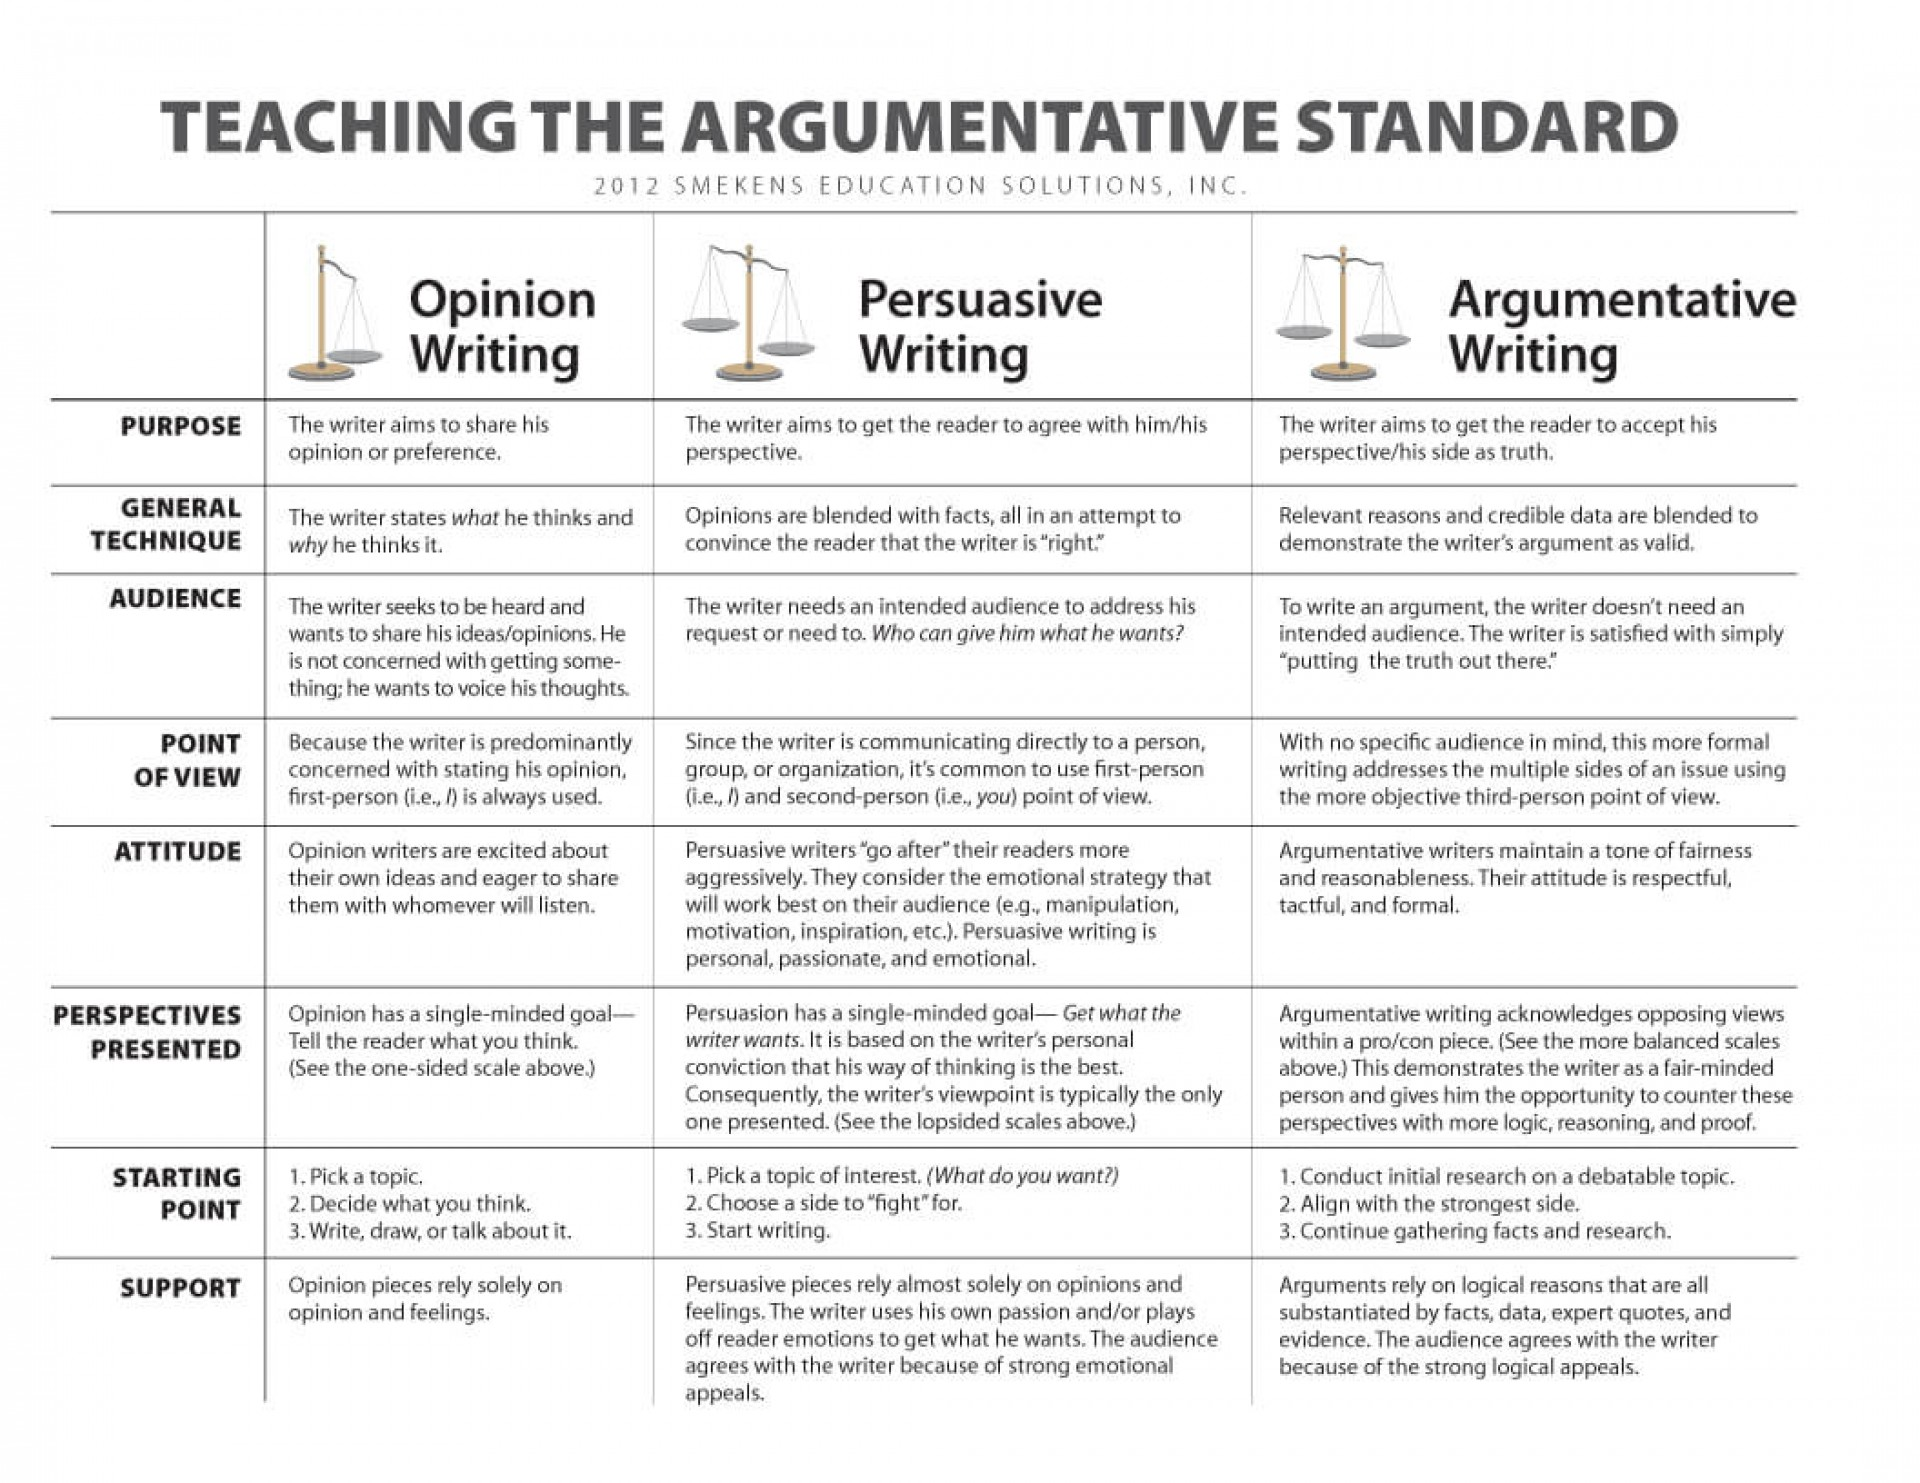 014 Teaching The Argumetative Standardo Essay Example How To Make Amazing A Persuasive Write In Apa Format Longer Introduction 1920